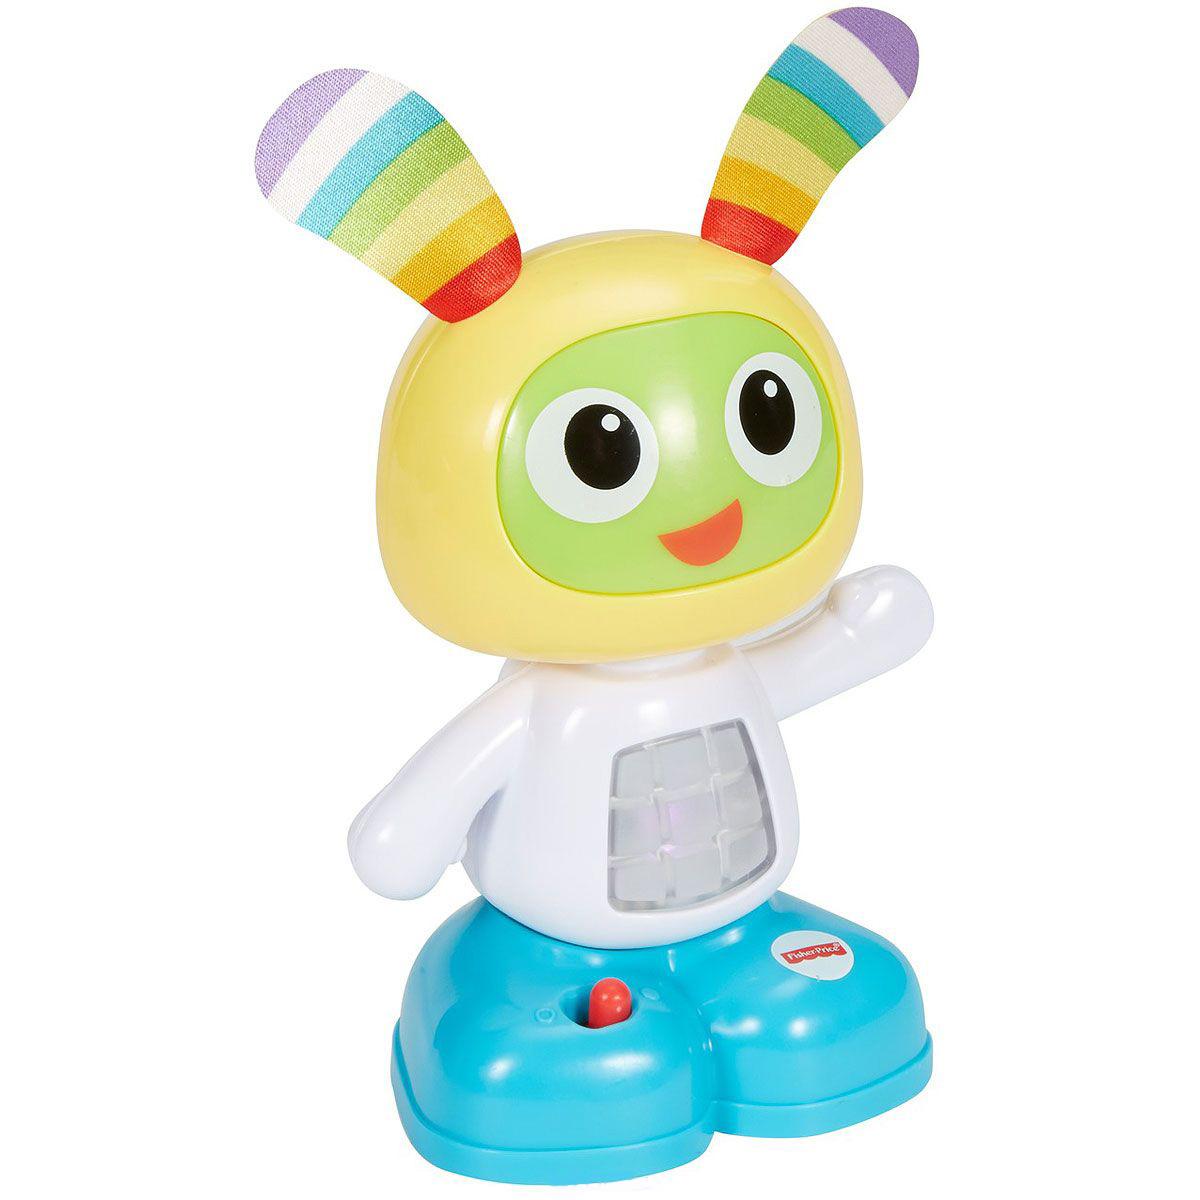 Fisher-Price. Мини-робот Бибо, свет и звукРазвивающие игрушки Fisher-Price<br>Fisher-Price. Мини-робот Бибо, свет и звук<br>